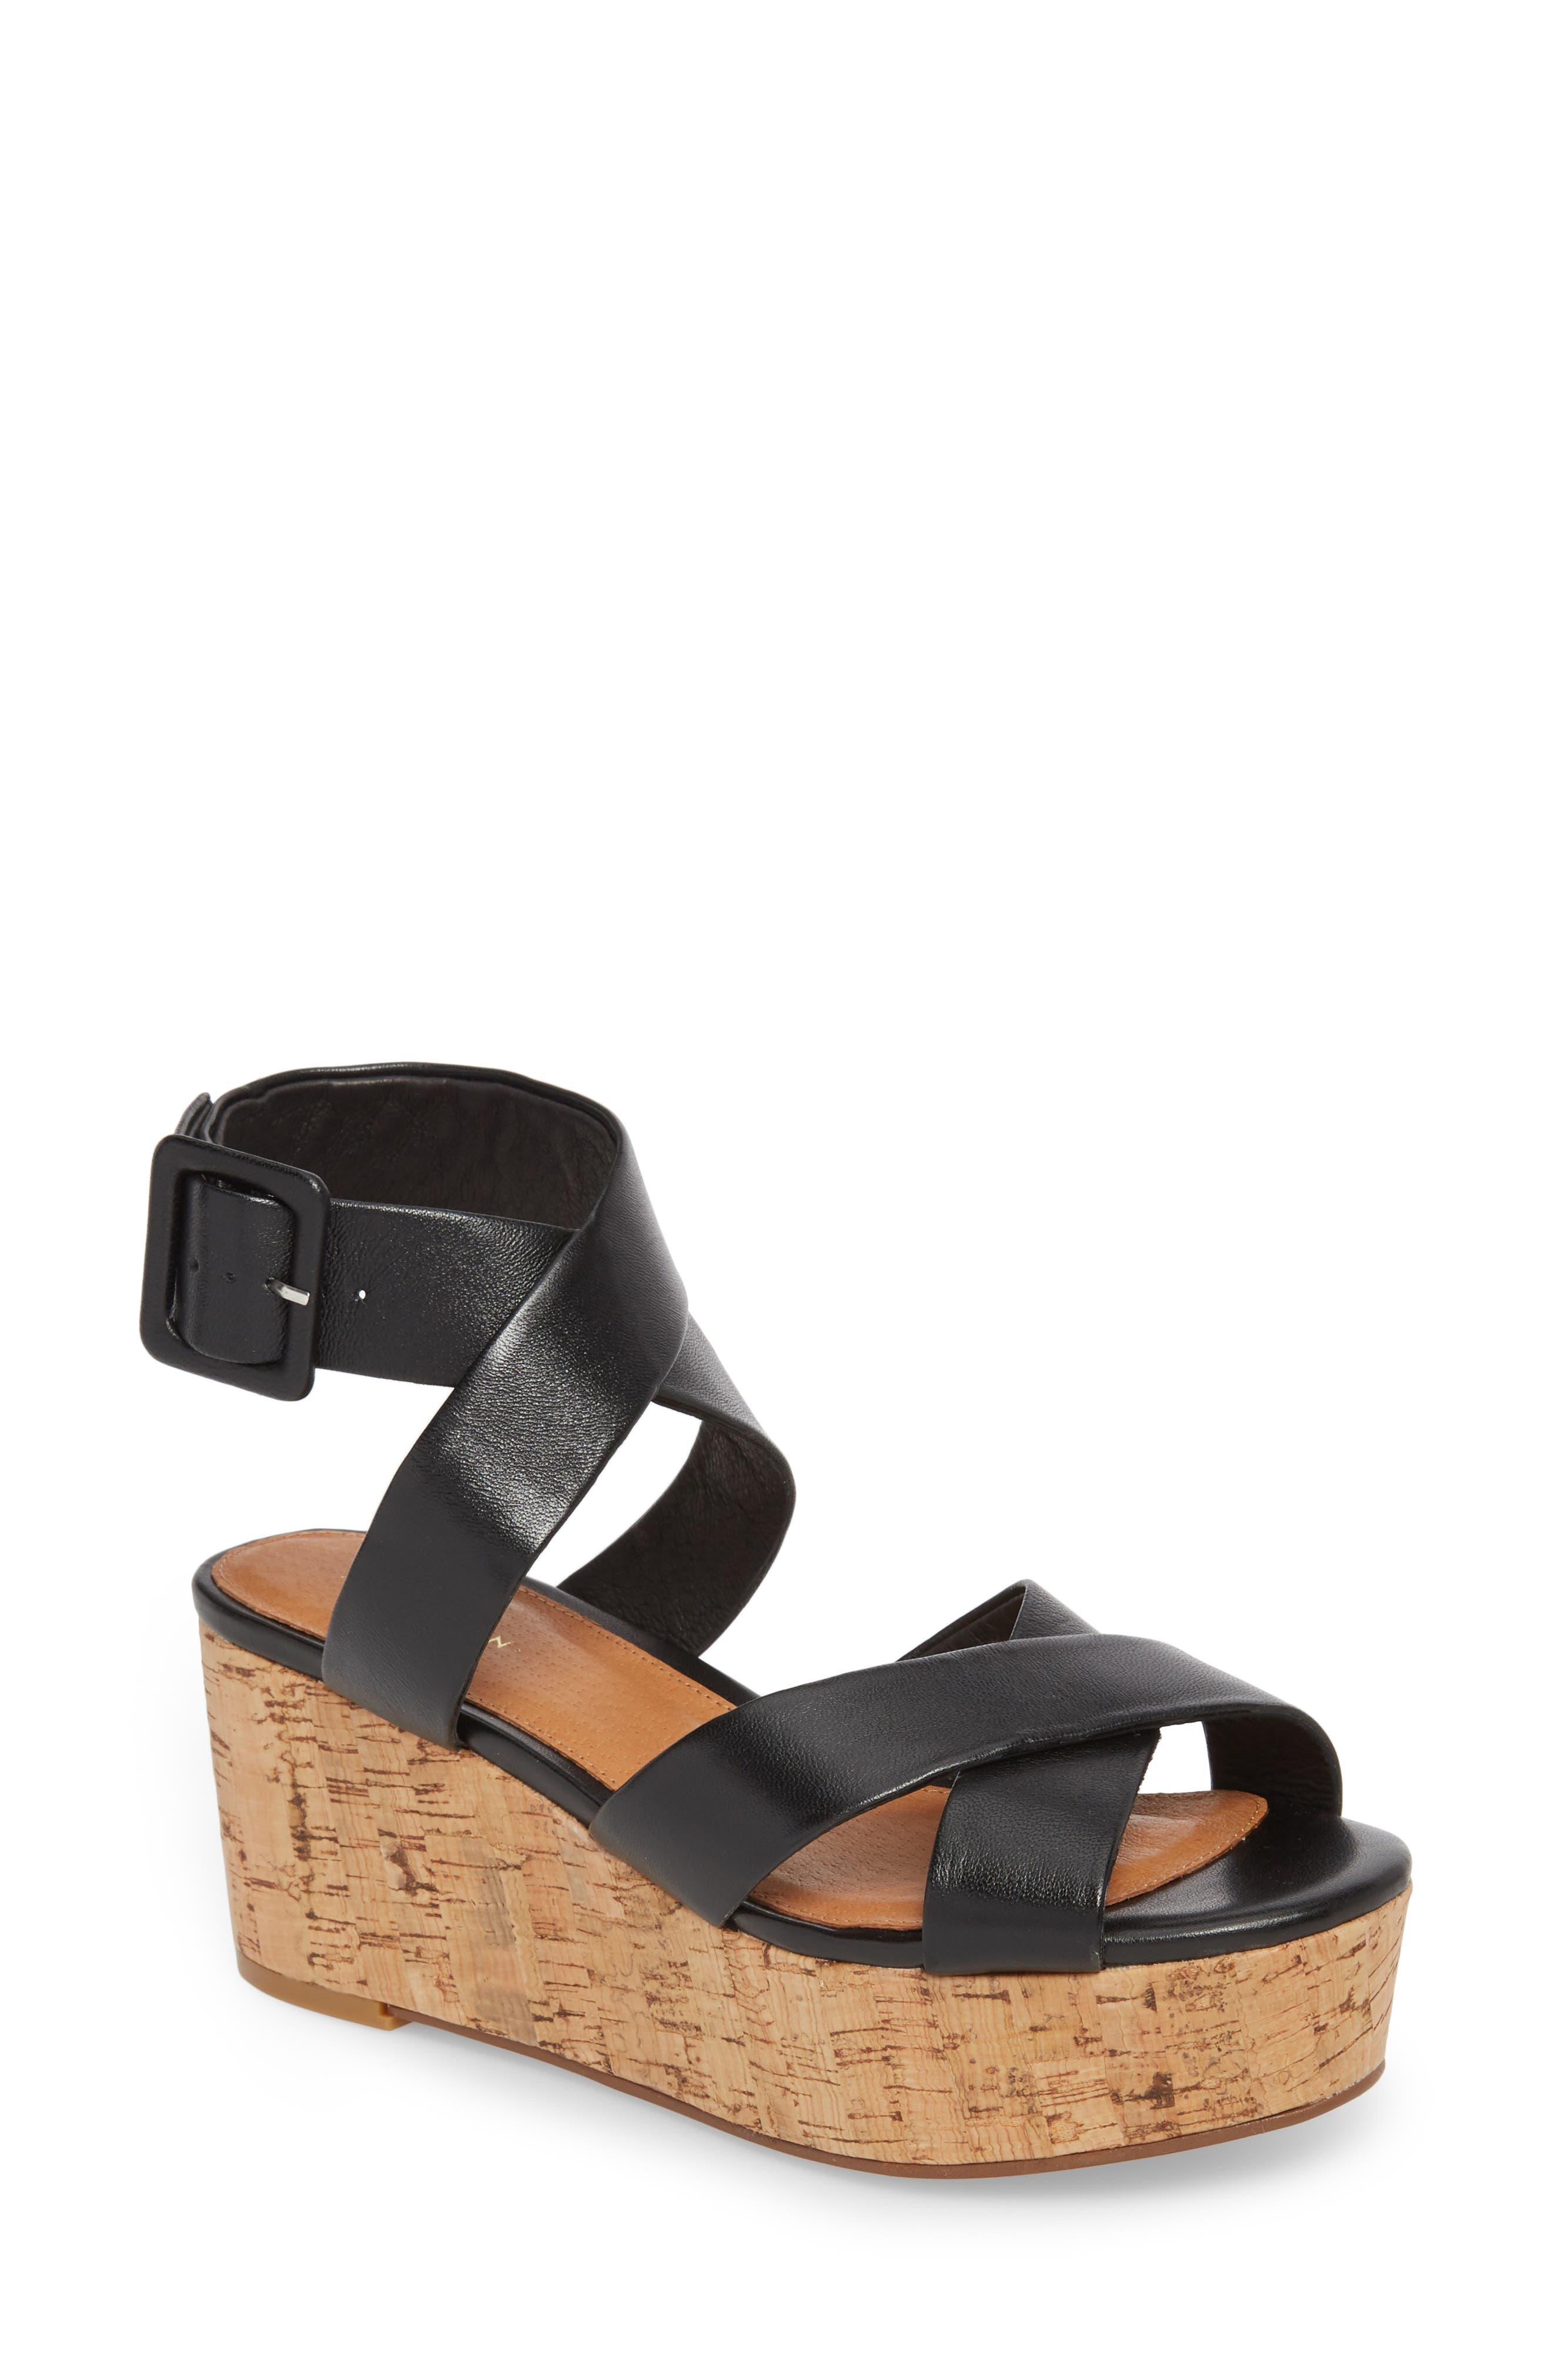 Evie Platform Wedge Sandal,                             Main thumbnail 1, color,